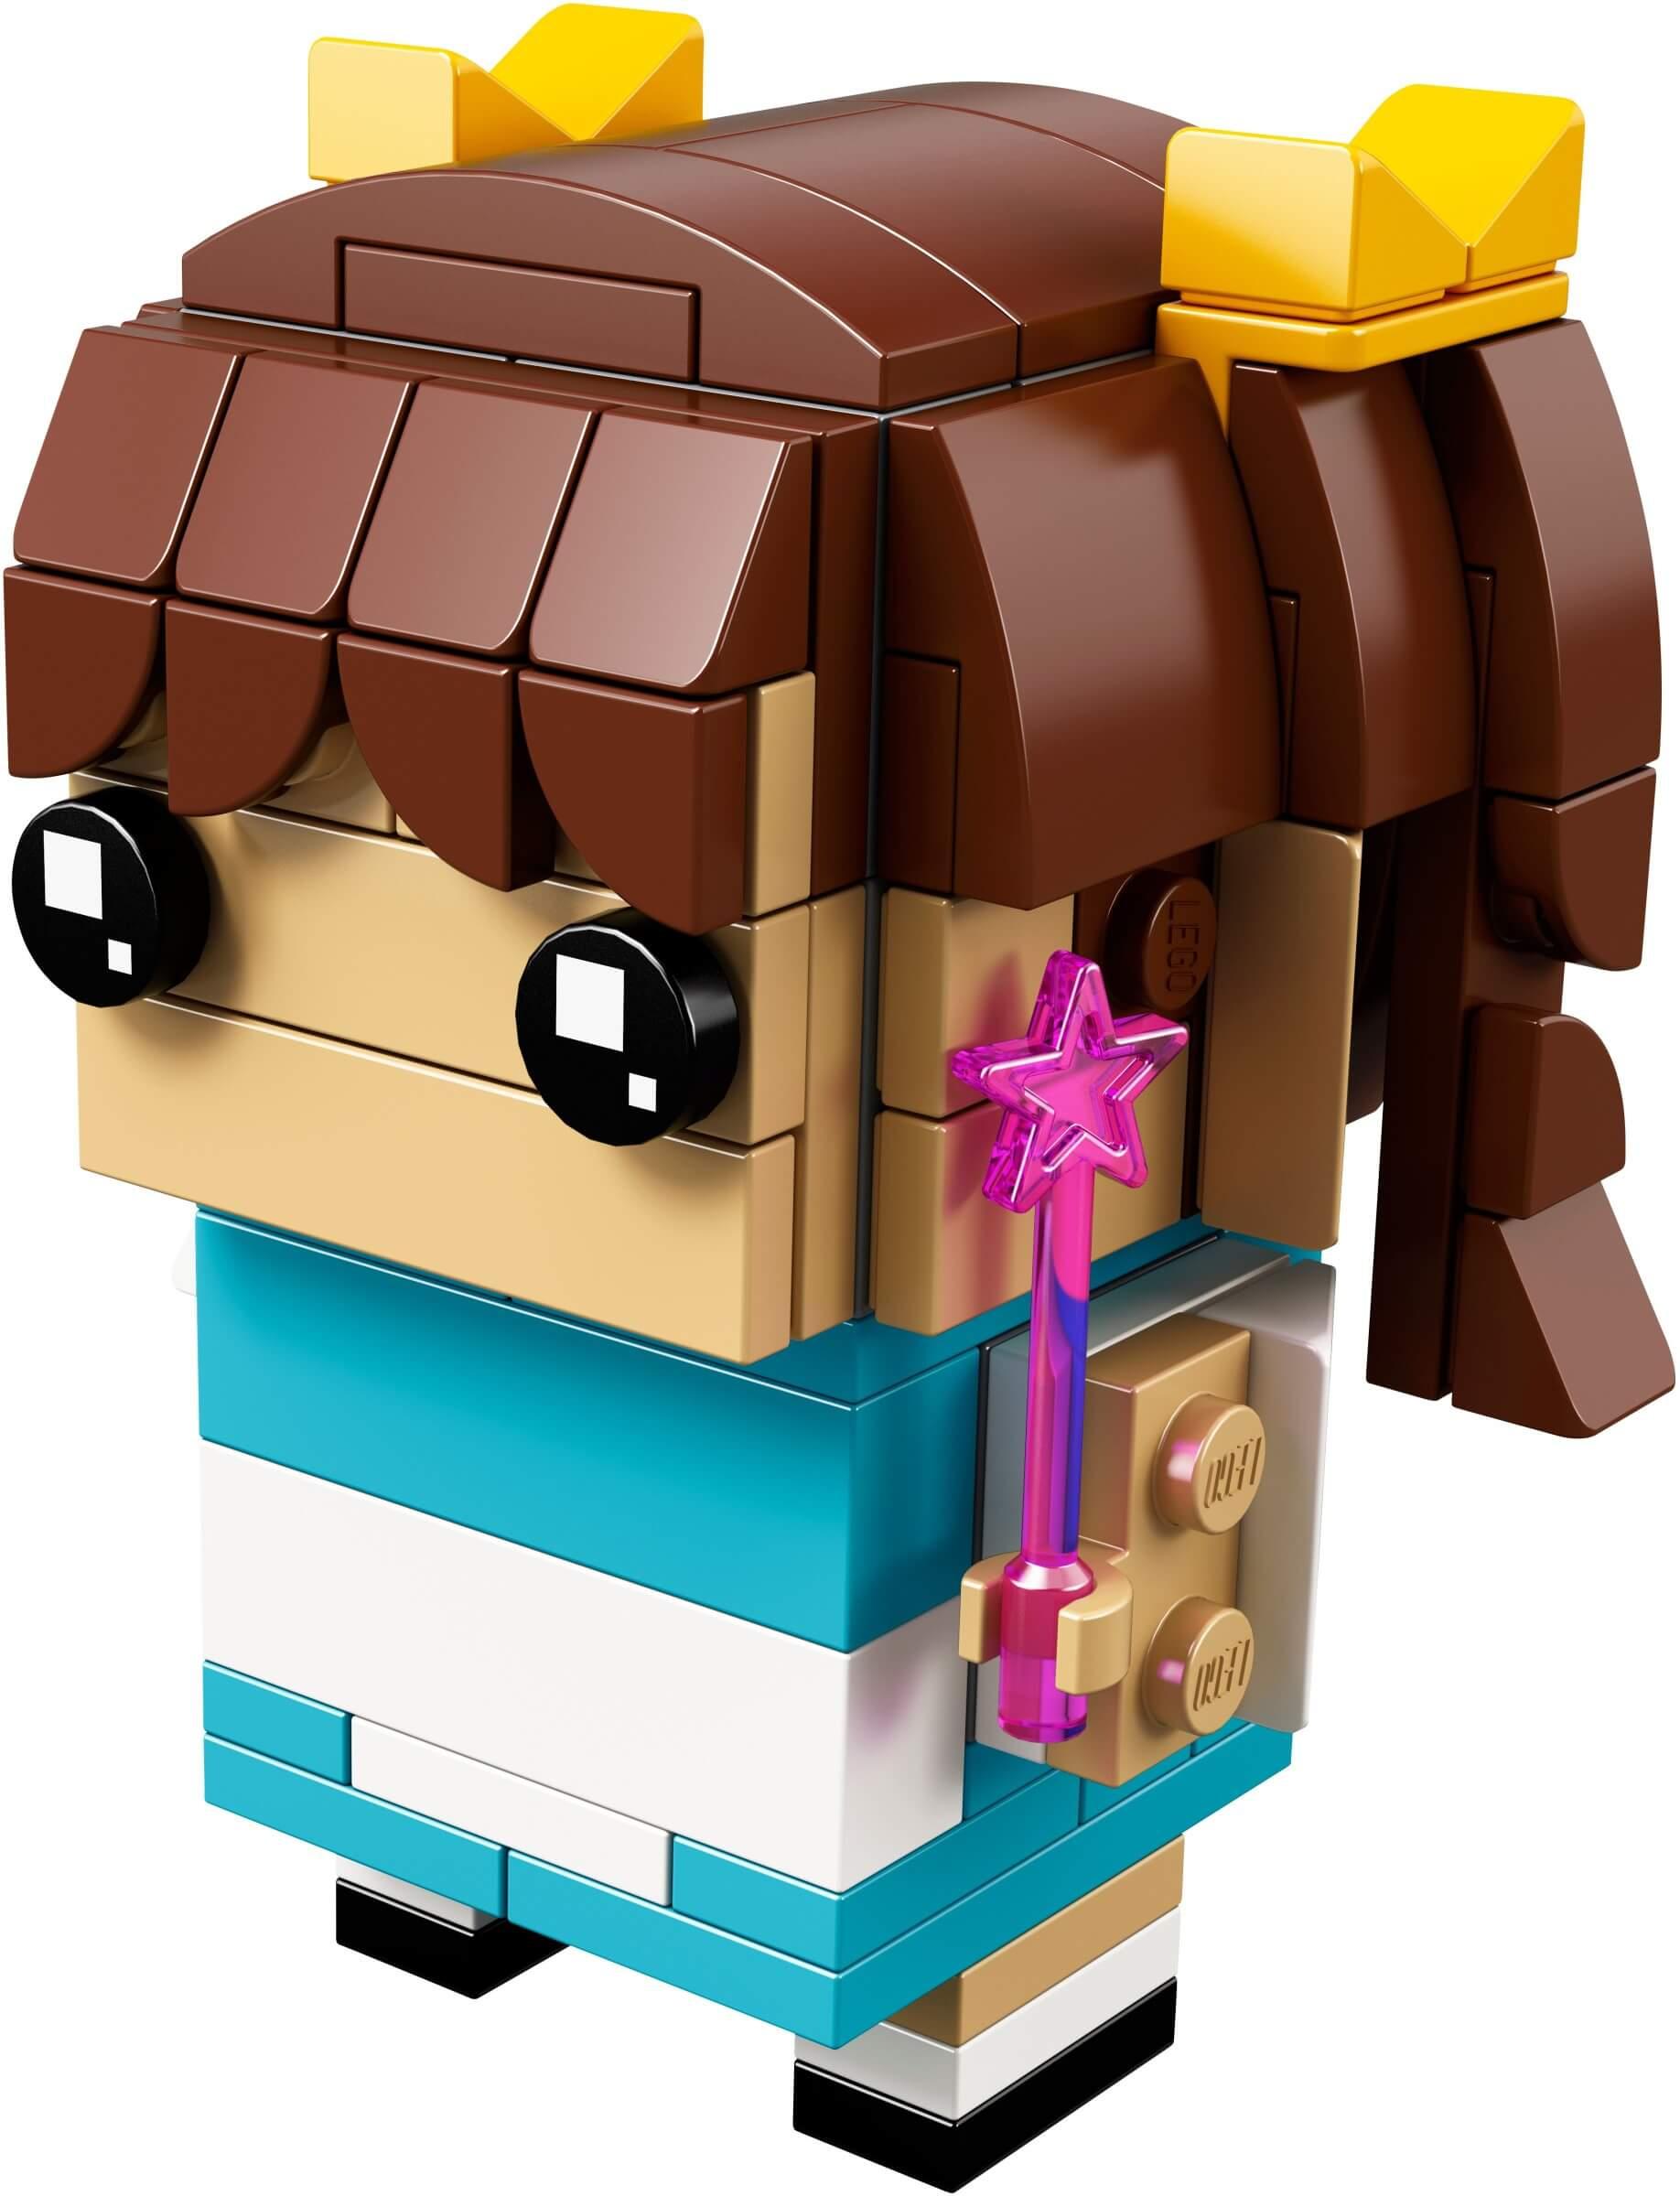 Mua đồ chơi LEGO 41597 - LEGO Ideas 41597 - Bộ Xếp Hình Nhân Vật Brickheadz (LEGO 41597 Go Brick Me)